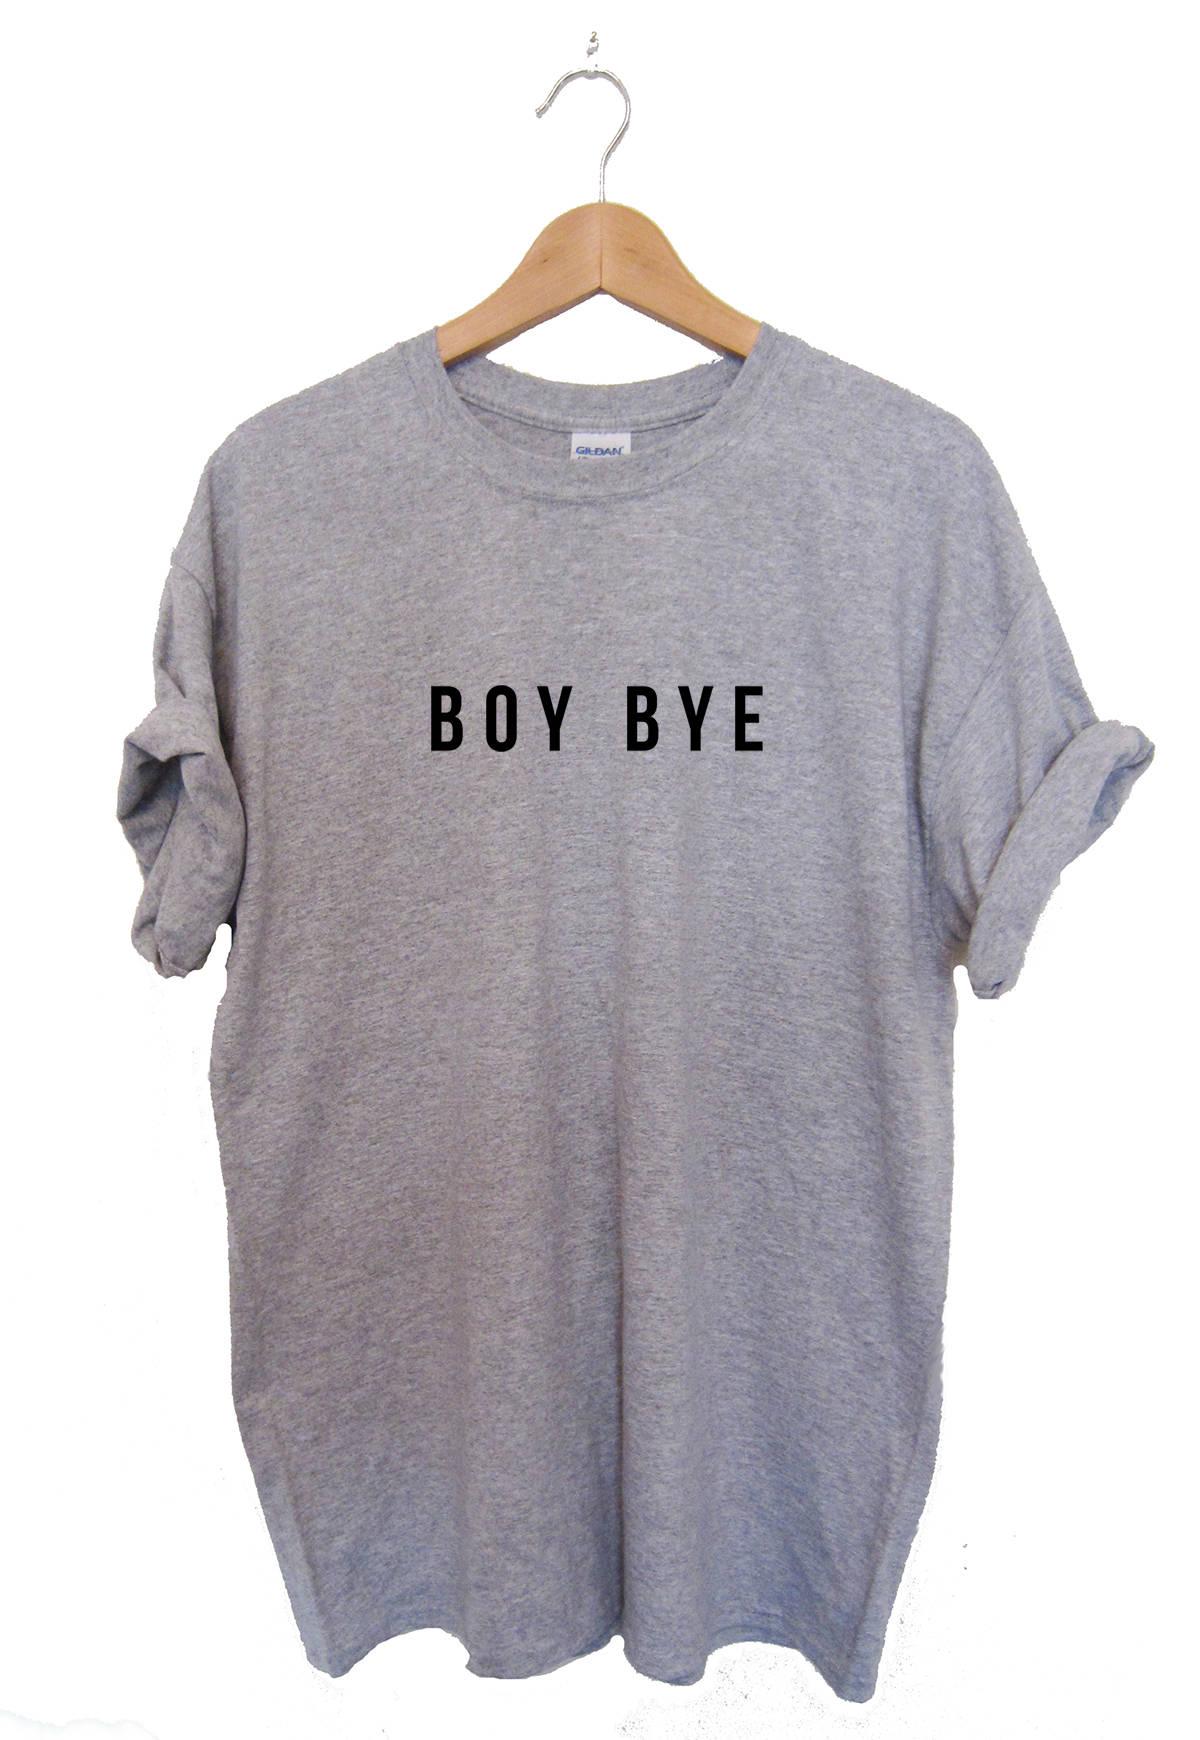 Boy Bye Tshirt Tee shirt Top Lemonade Ashes to Ashes High Quality SCREEN PRINT Super Soft unisex Worldwide ship Hipster Brand New